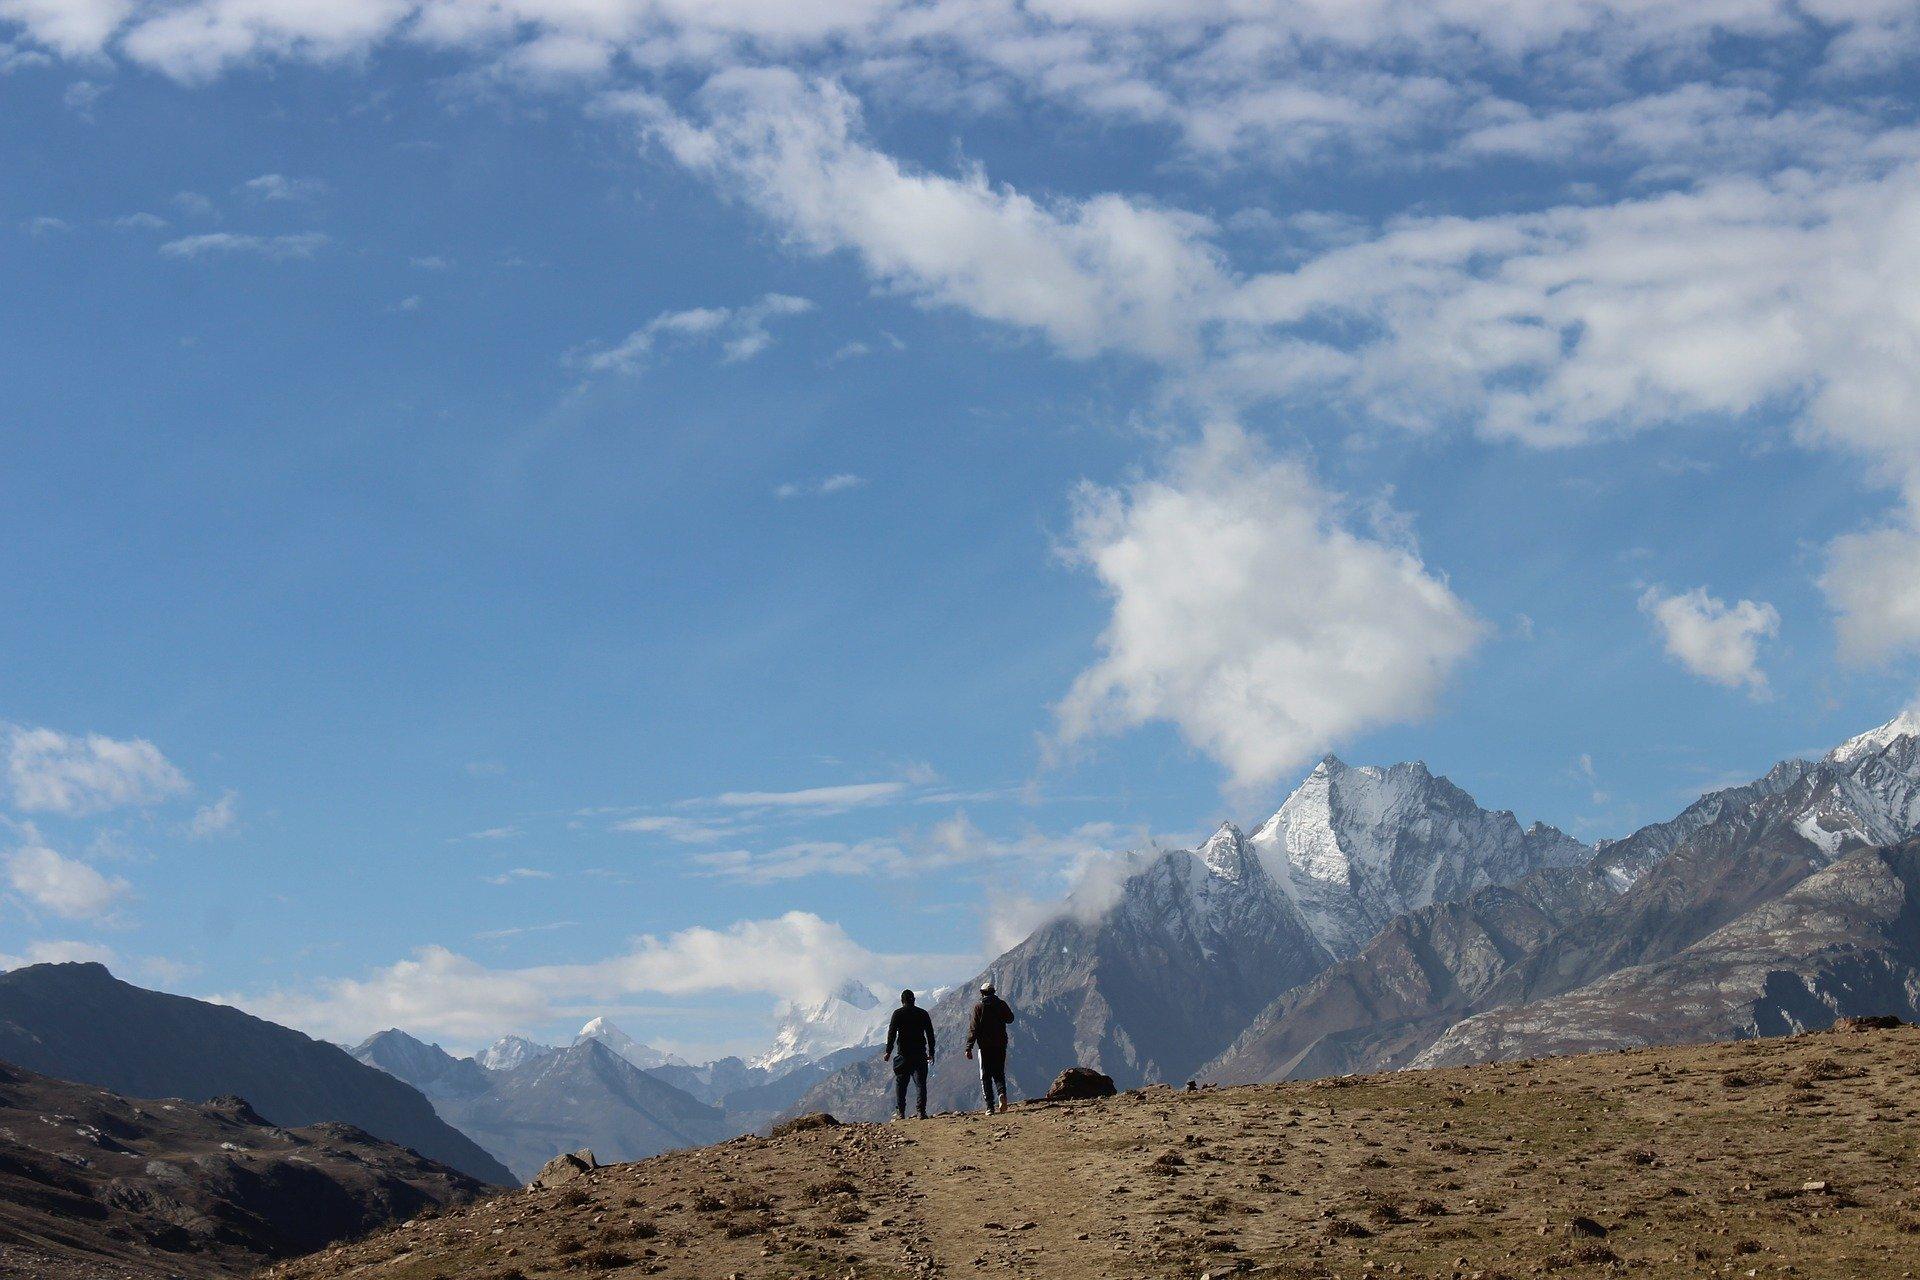 Into the peaks, top 10 adventure activities in India